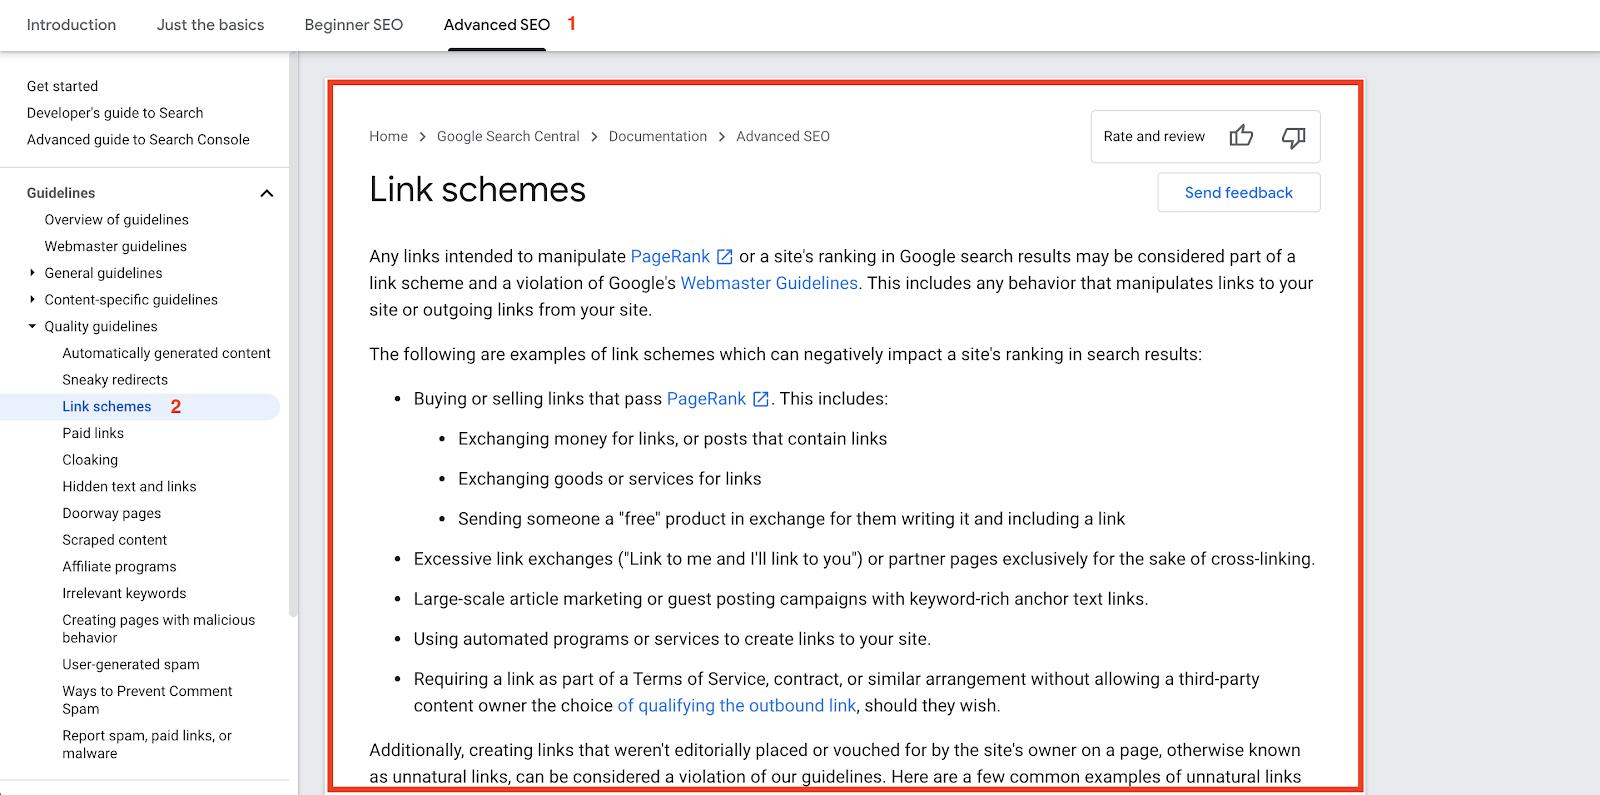 Google link violation terms